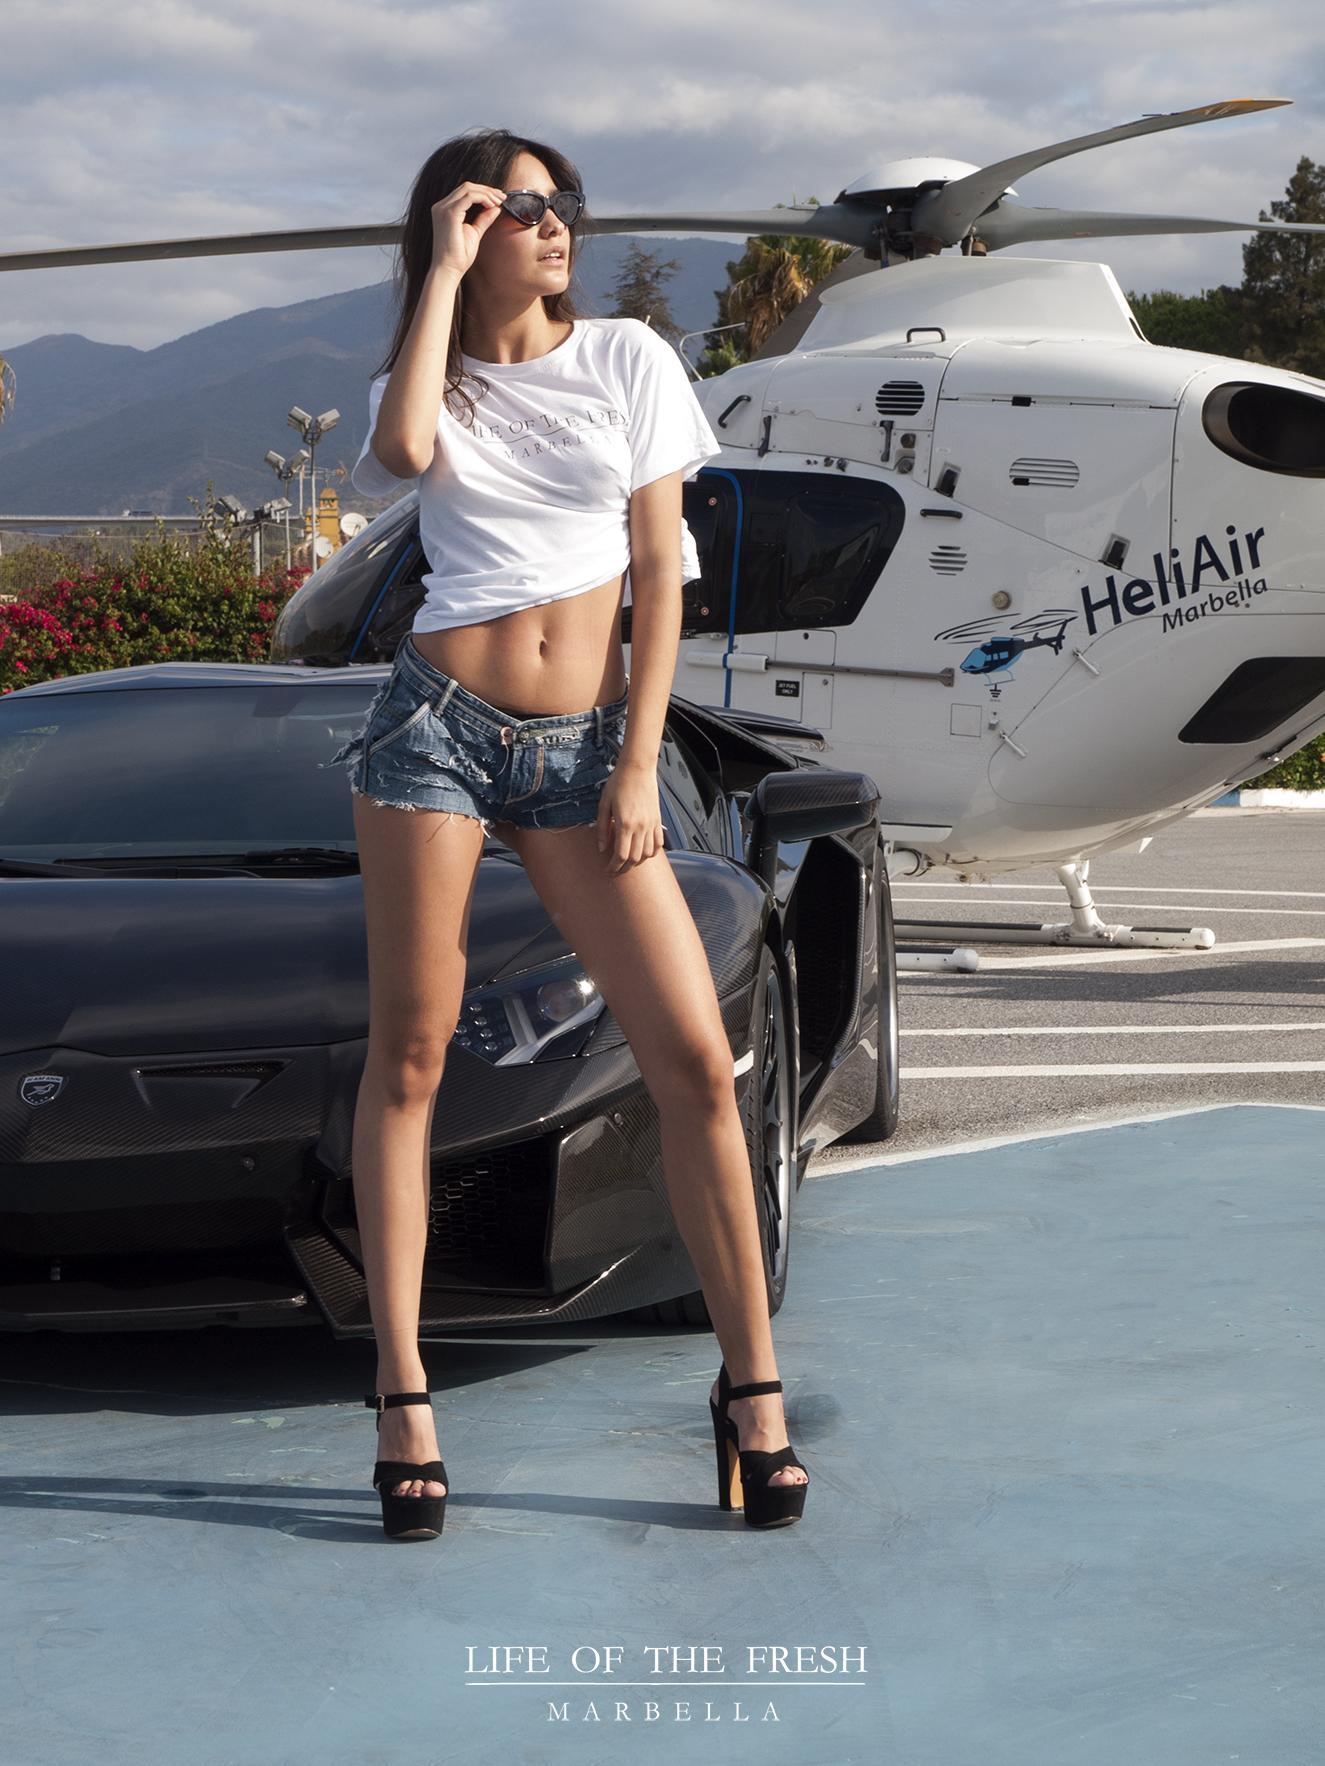 Model - marbella lifeatyle